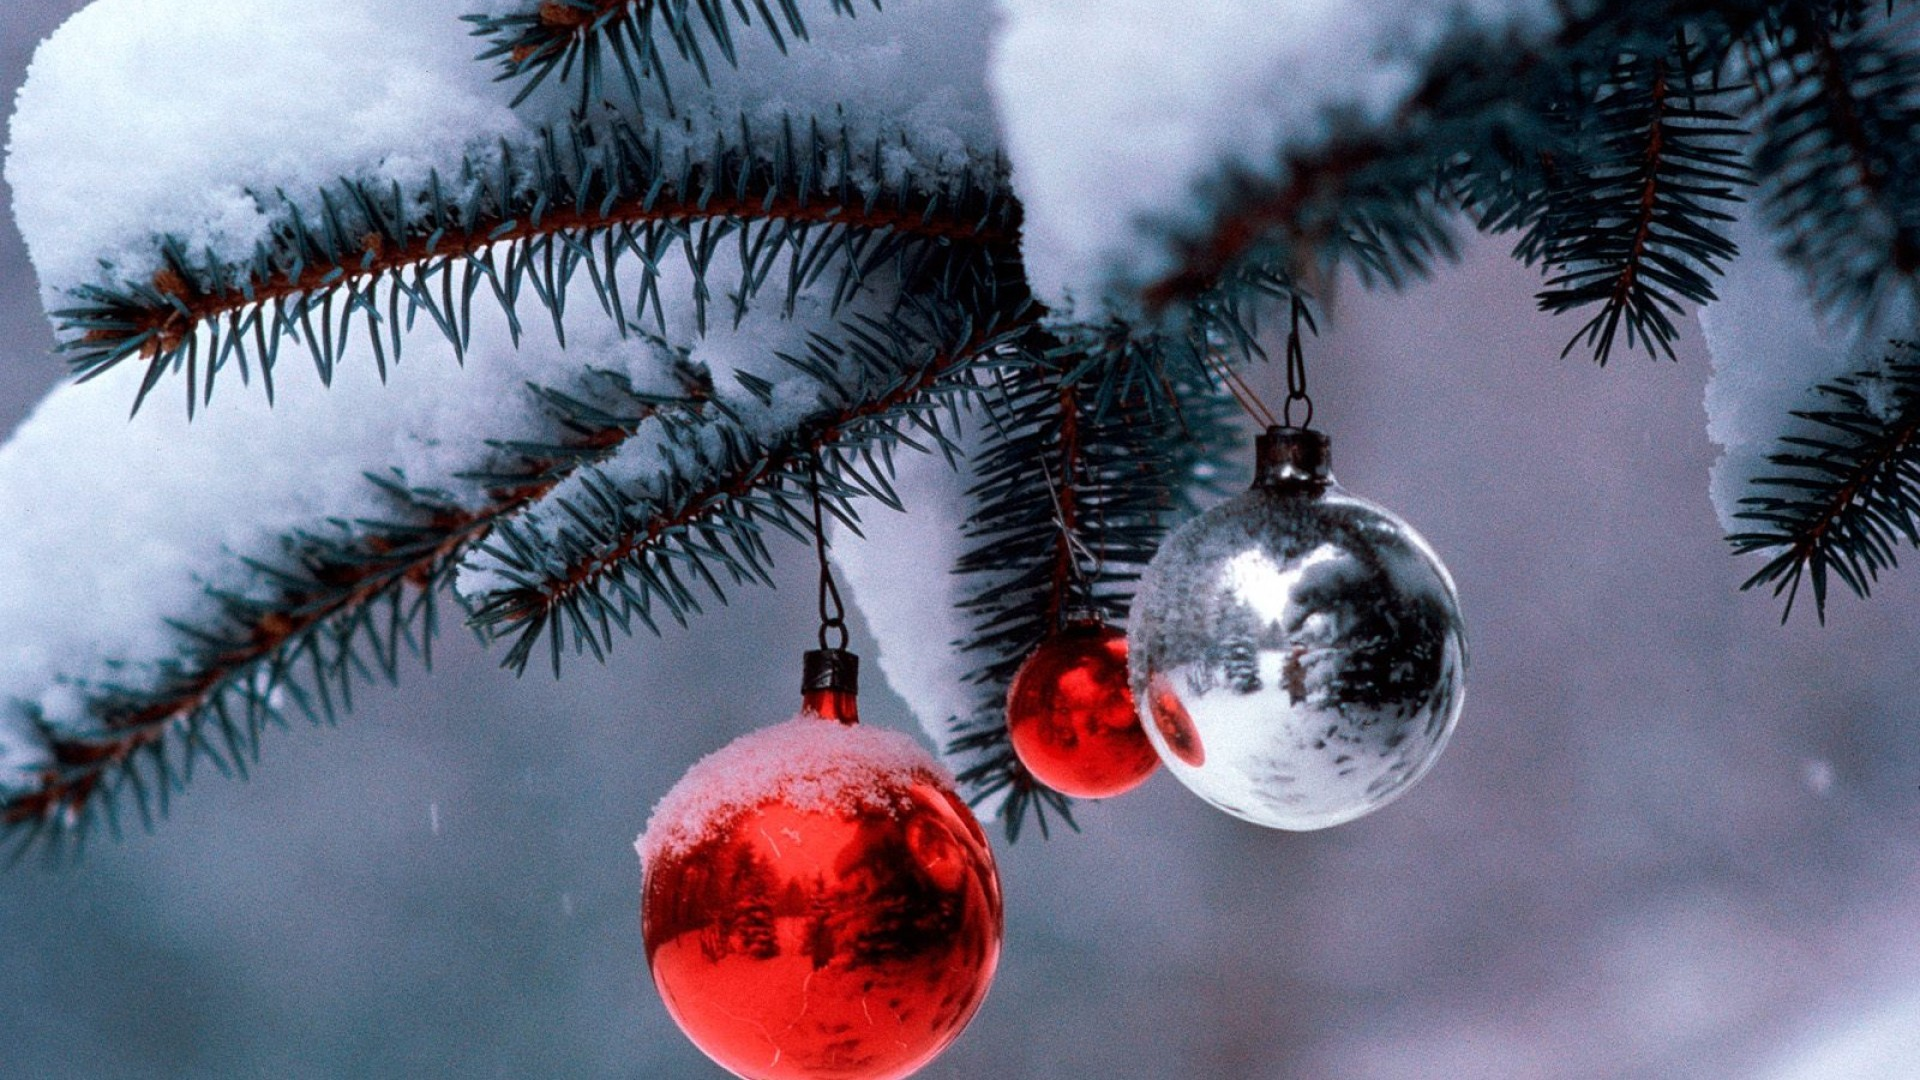 Christmas Tree Globe Decorations Desktop Wallpaper Uploaded by DesktopWalls